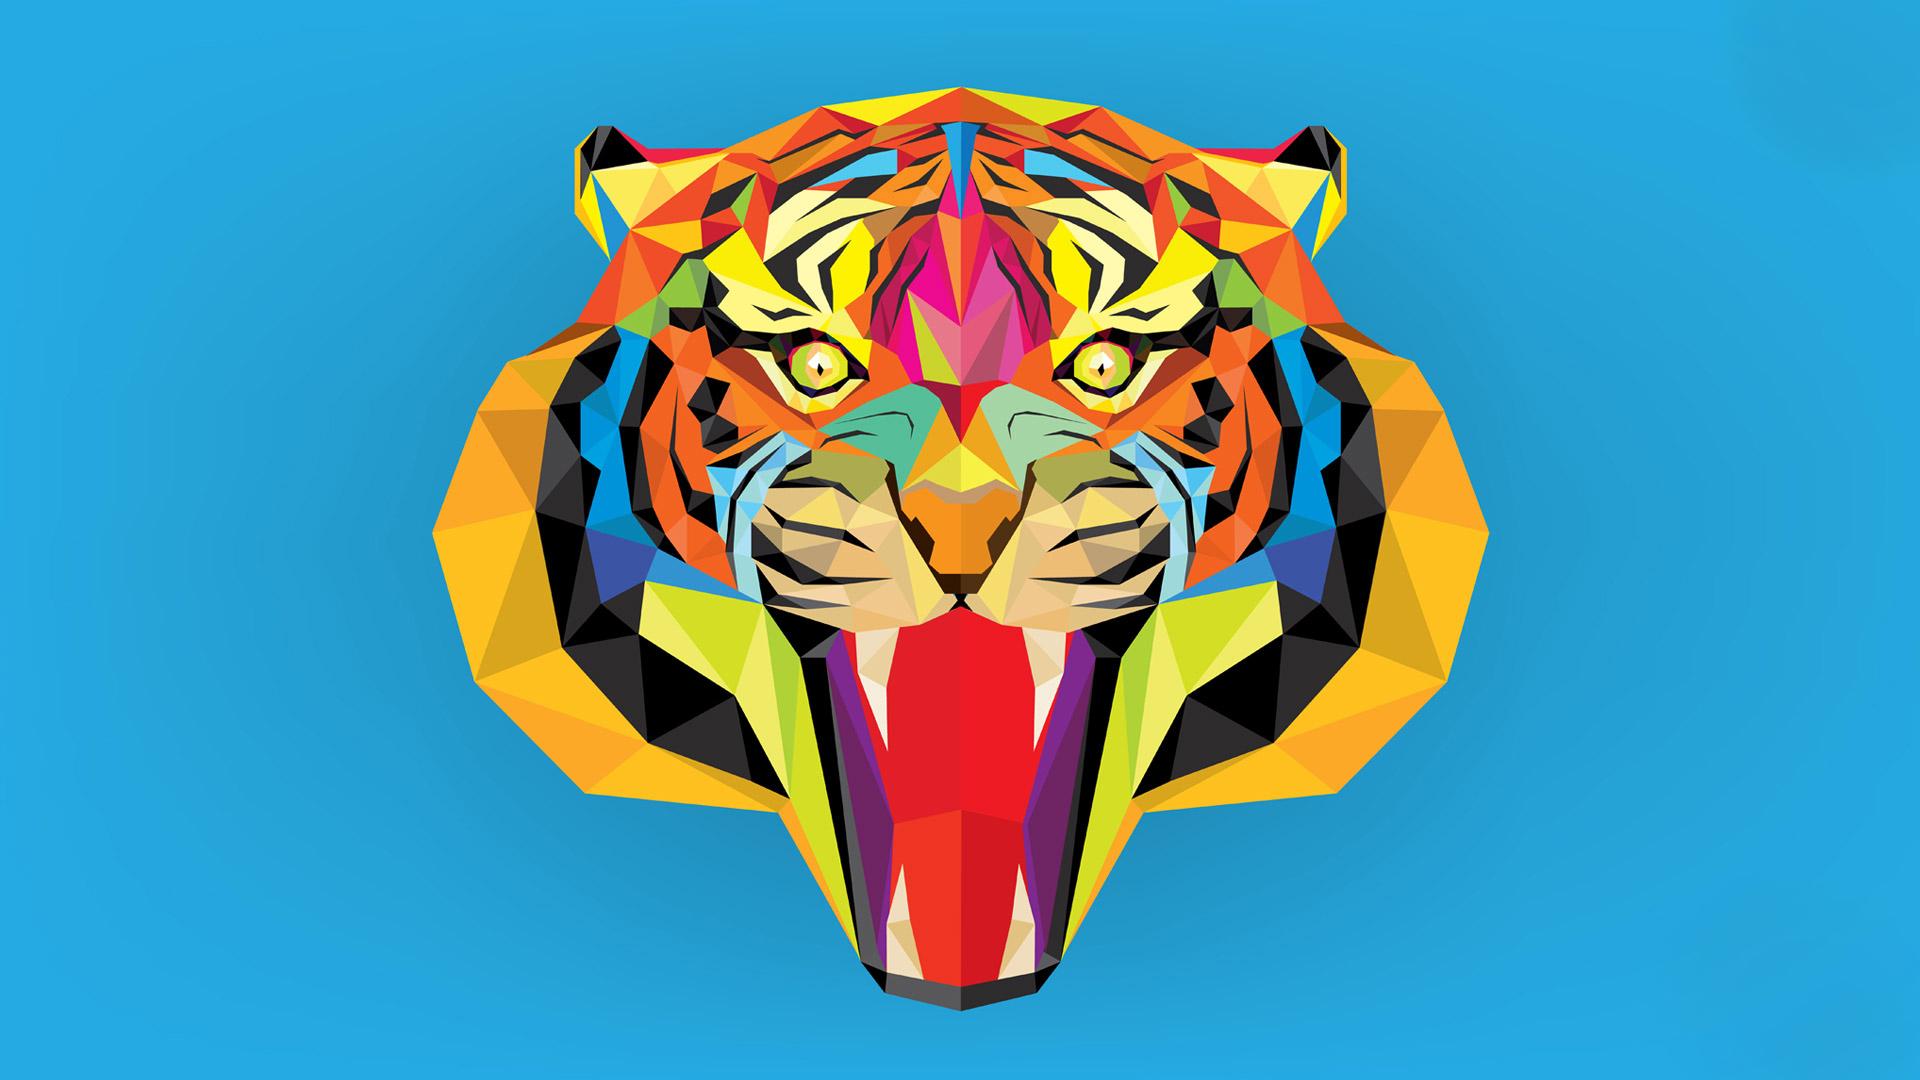 Polygon Tiger Computer Wallpaper